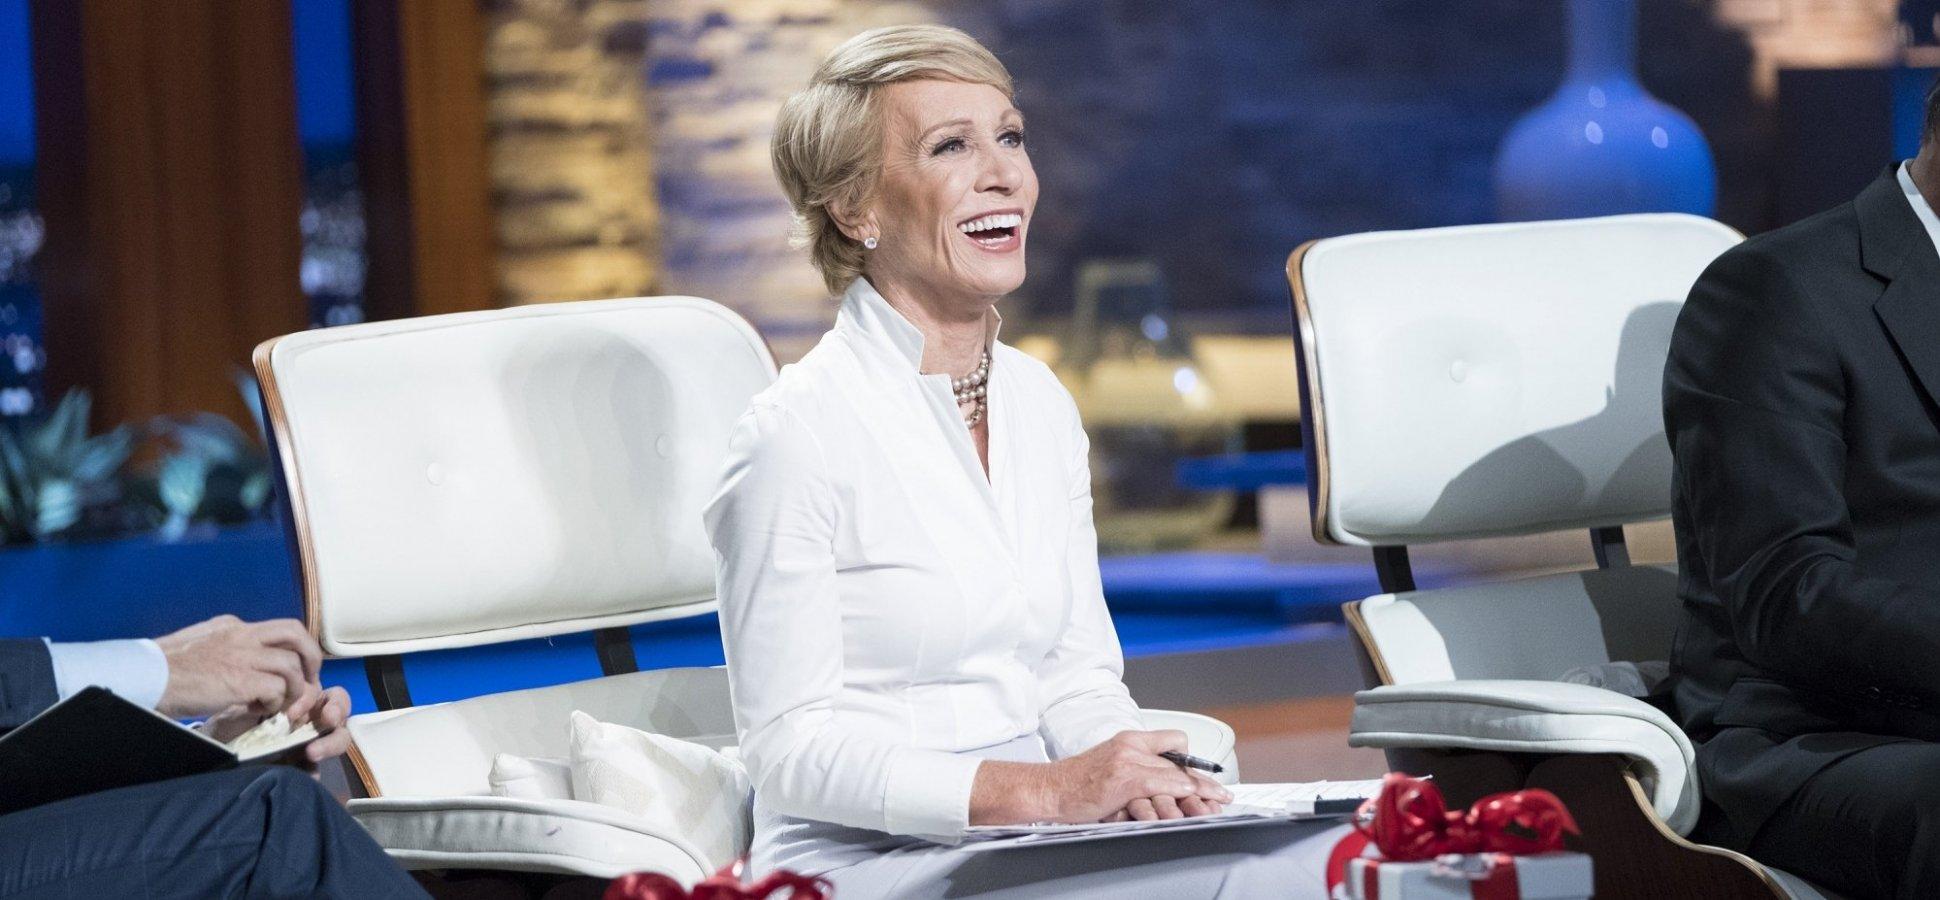 Shark Tank's Barbara Corcoran Says 1 Mental Habit Separates Successful People From Everyone Else